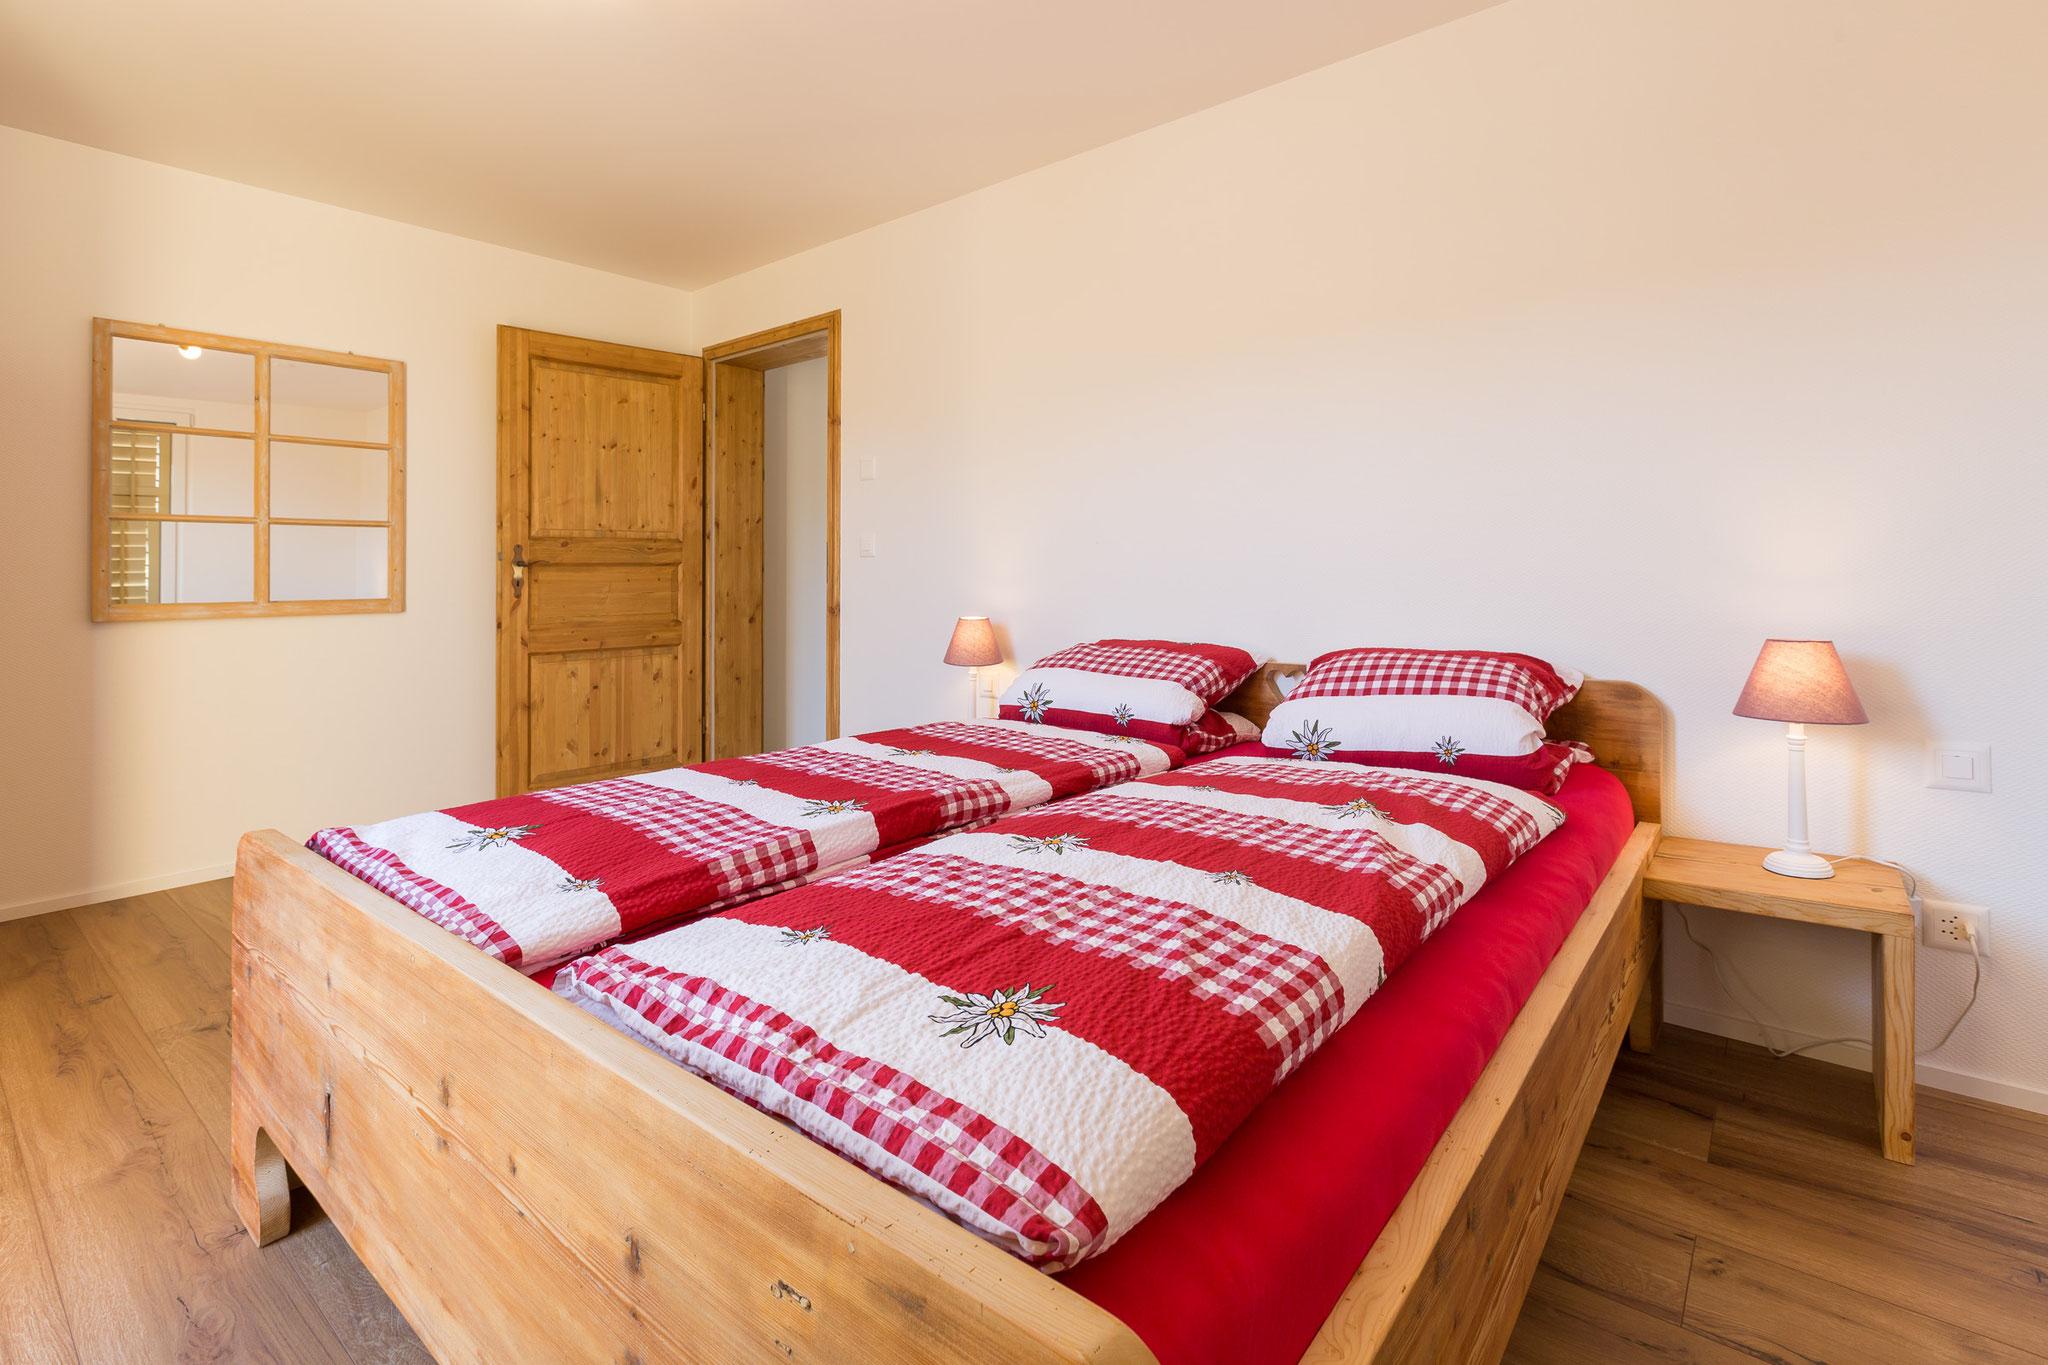 bedroom #1 (photo 1/3)